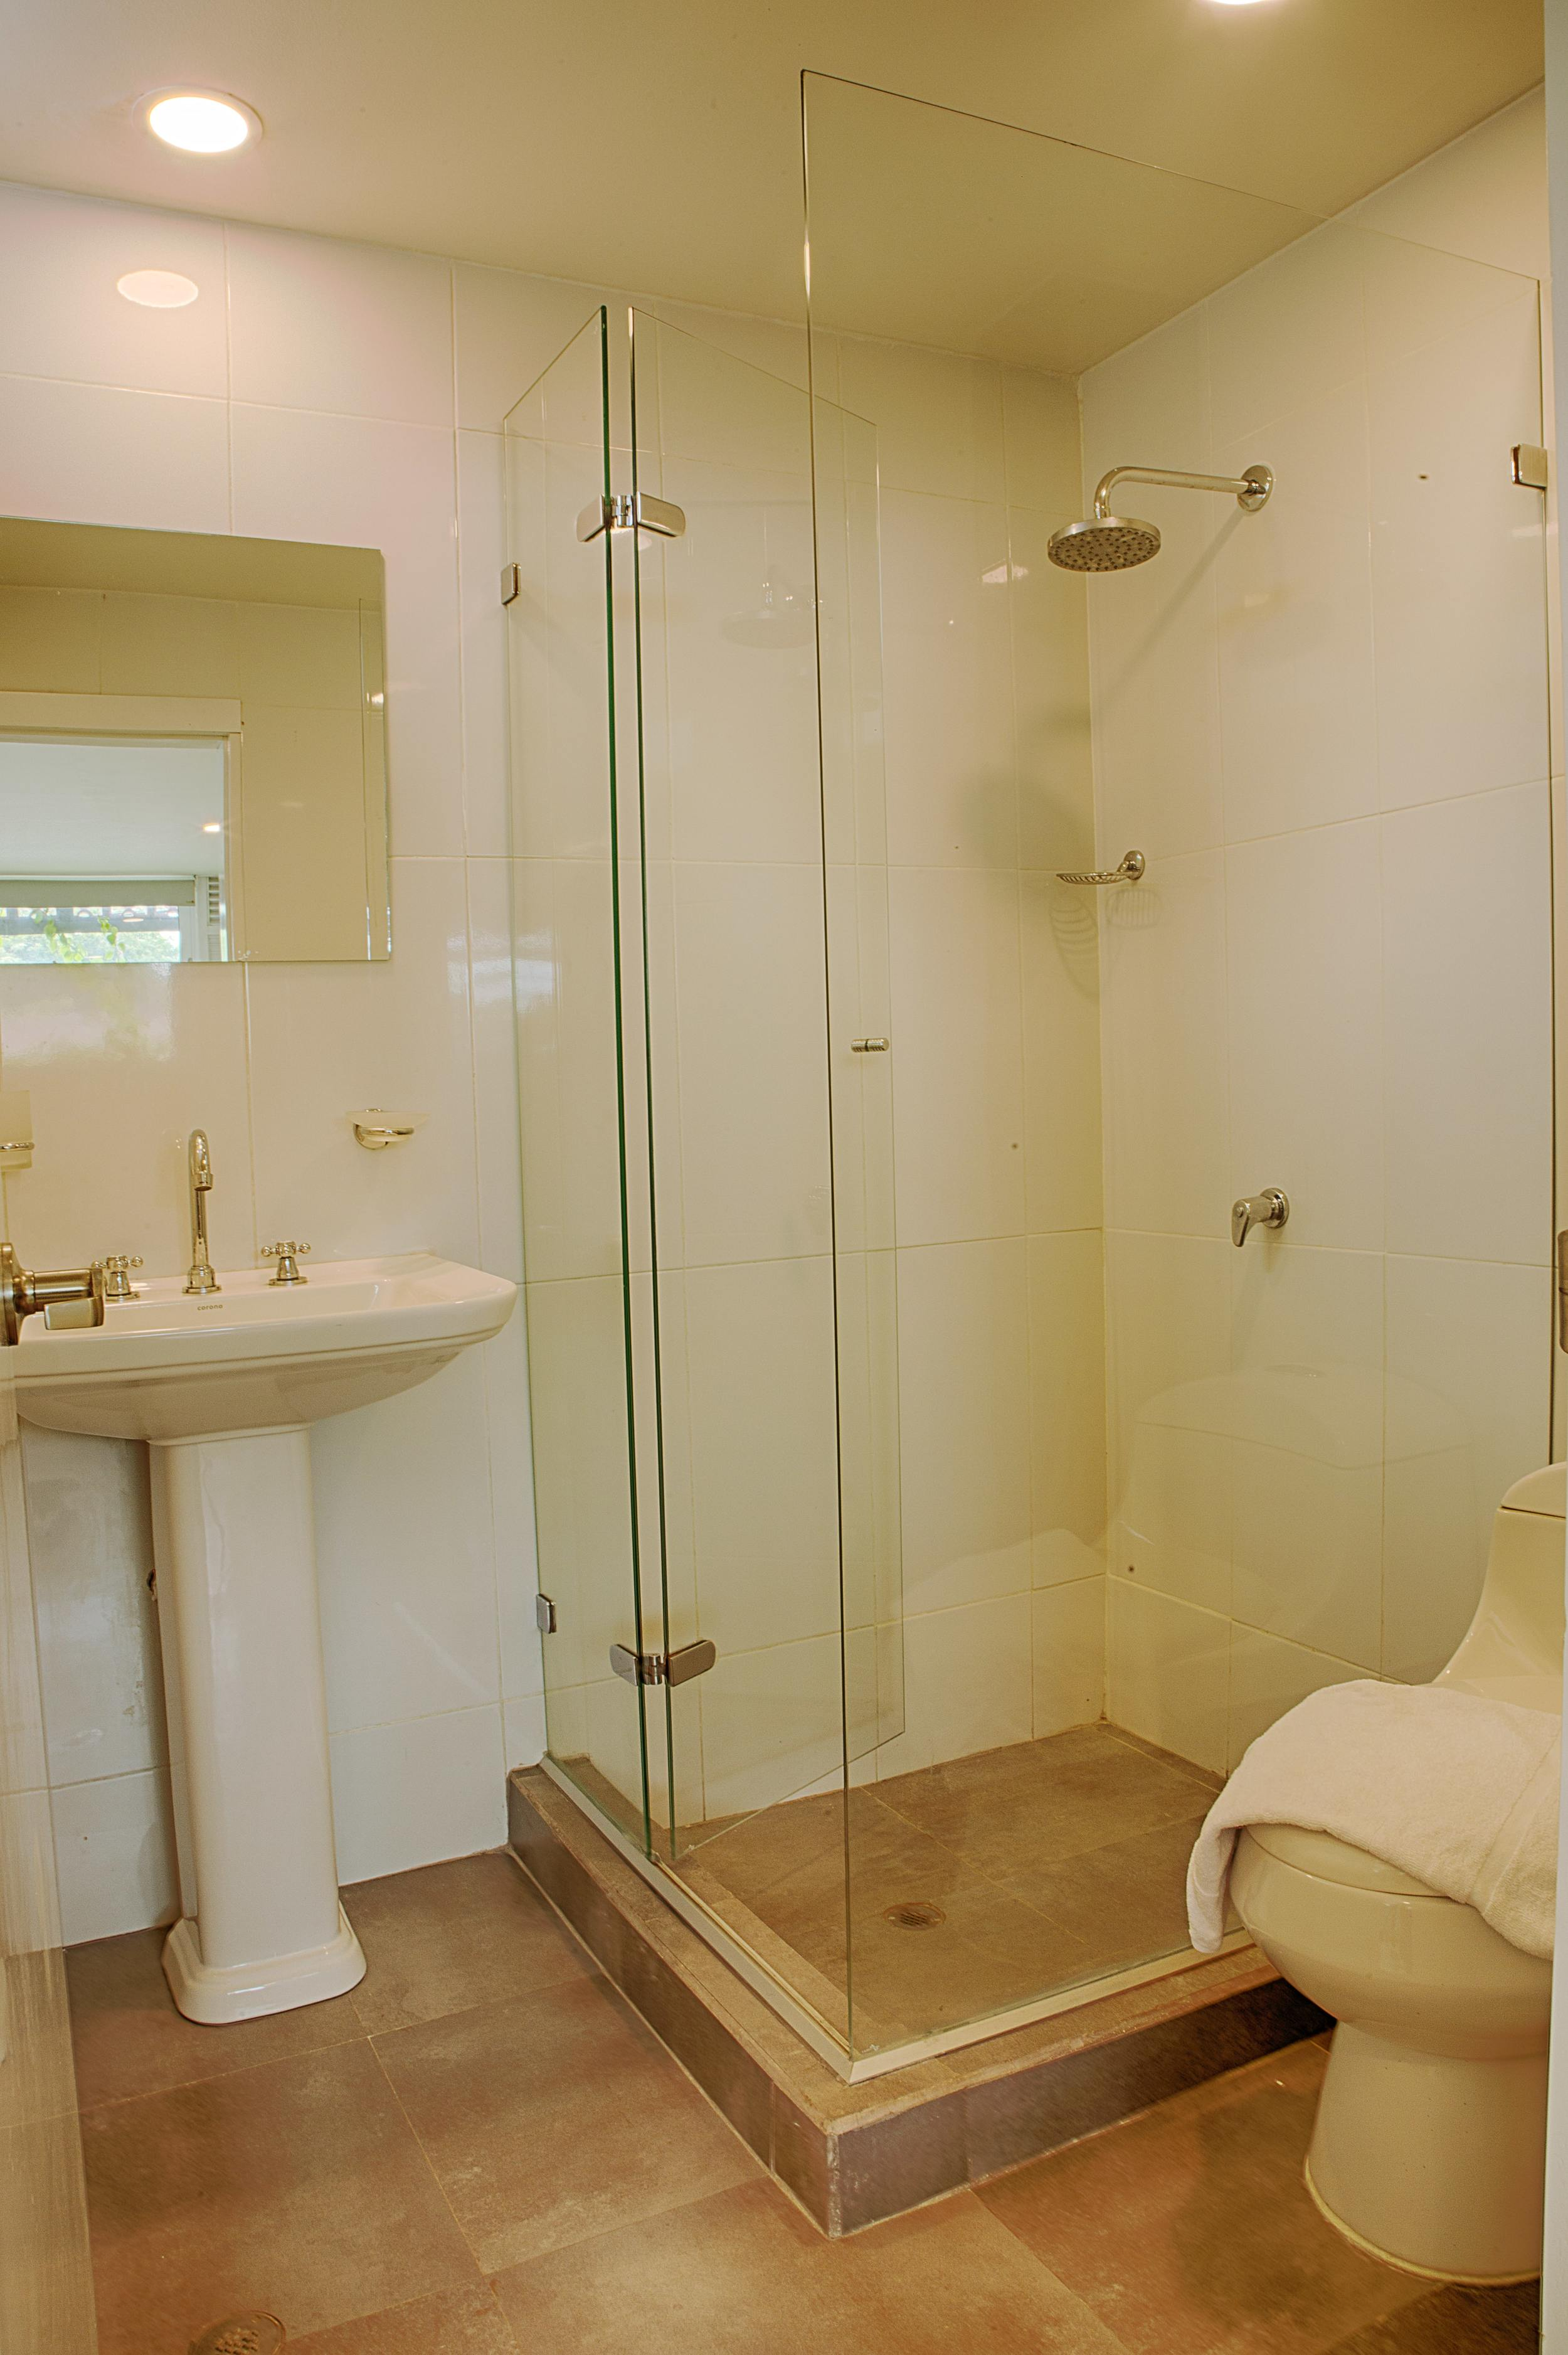 204-Bathroom.jpg